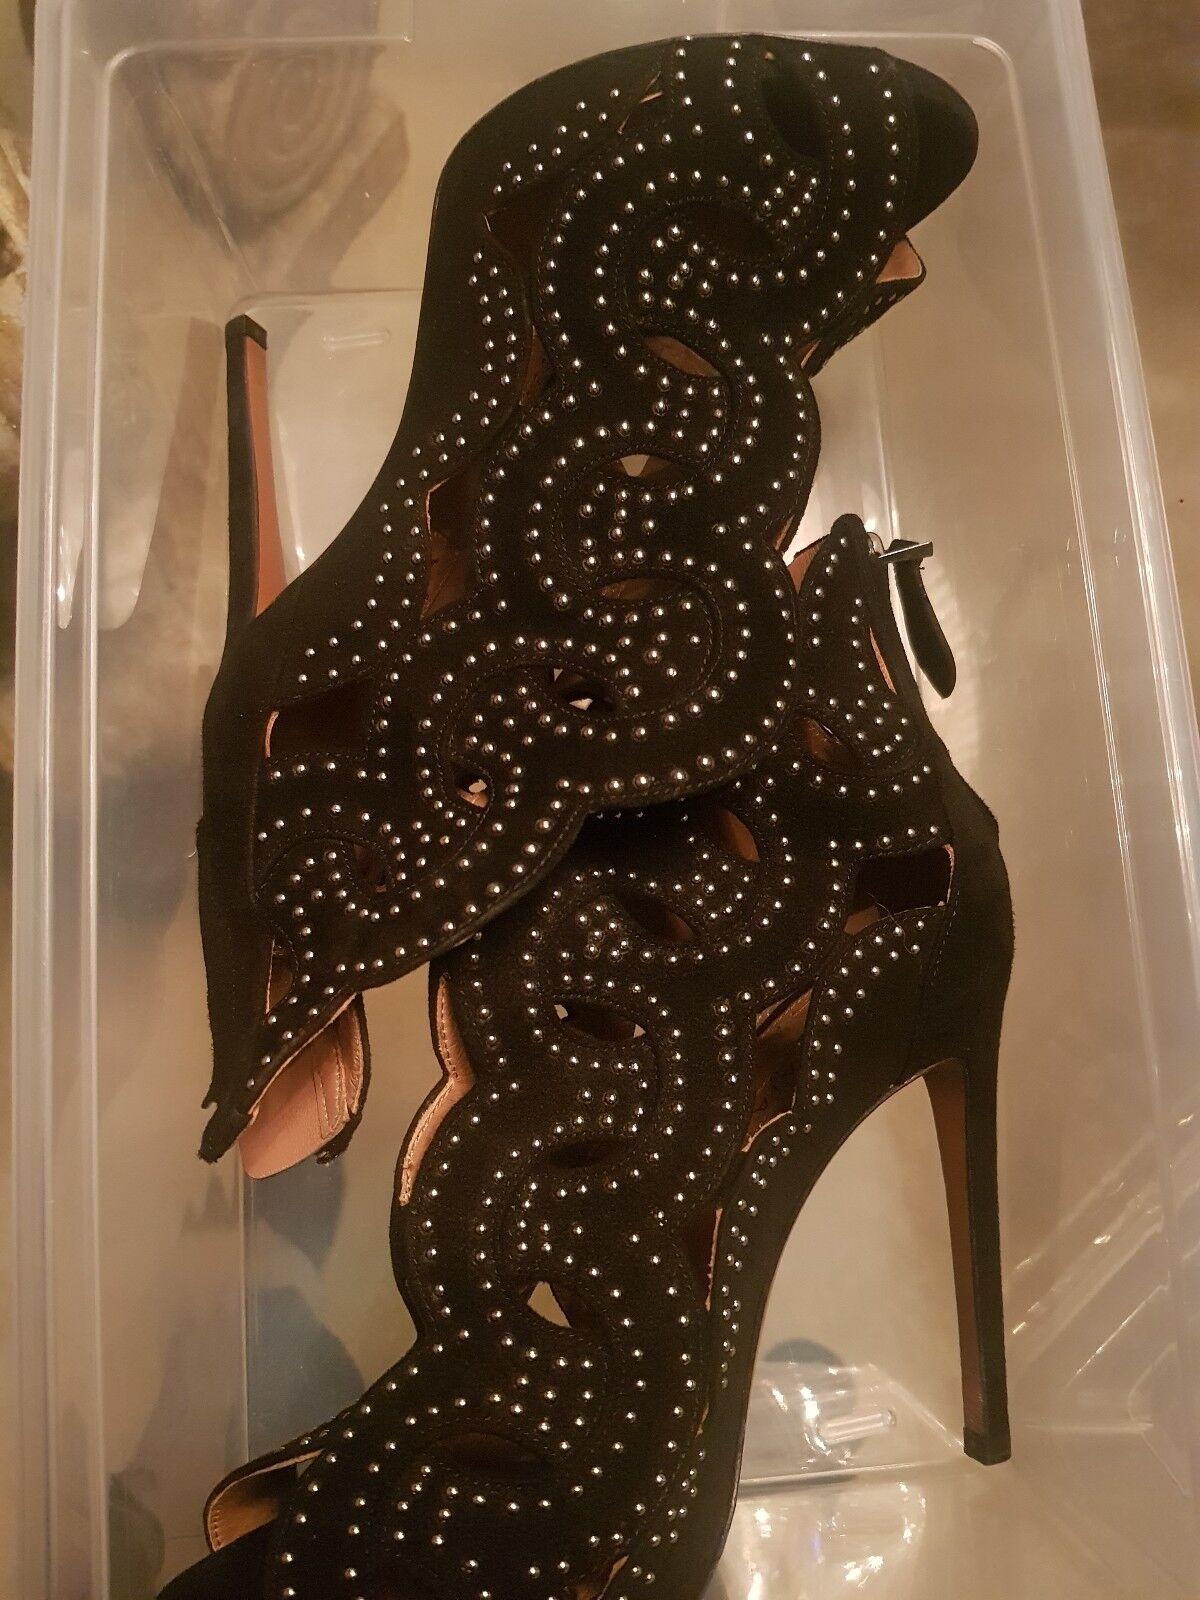 Alaia Studded Studded Studded Scalloped Suede Peep Toe Bootie 36.5 56b0e1